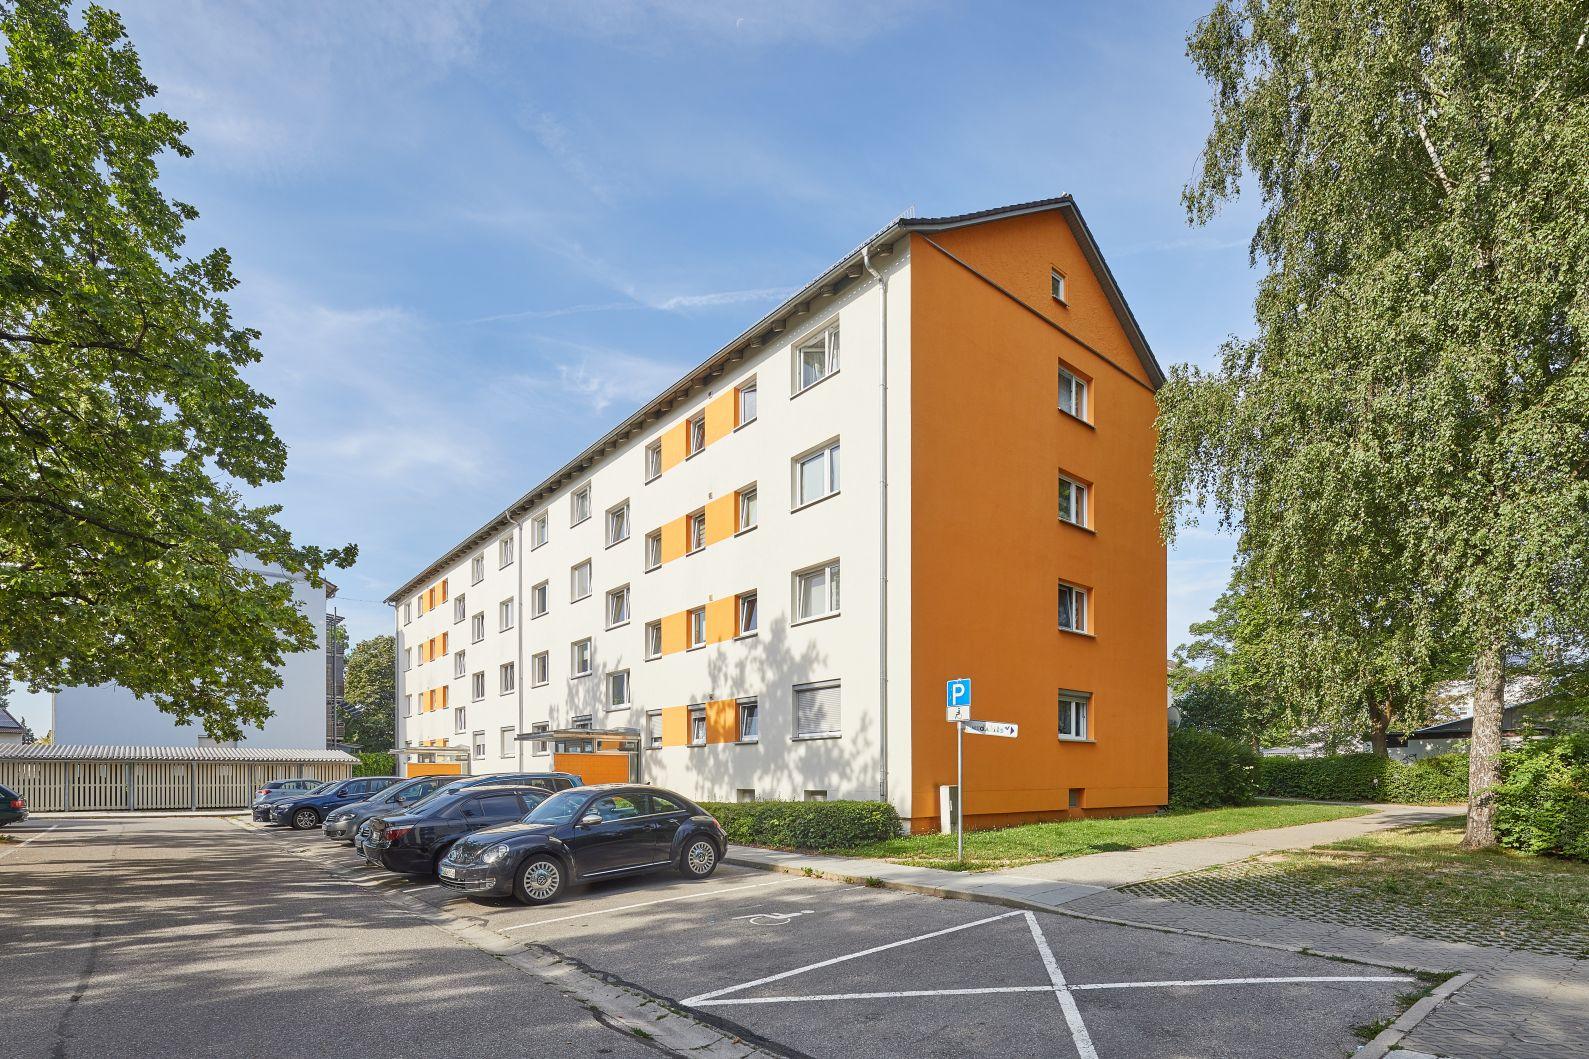 Richard-Wagner-Straße 47 - 53